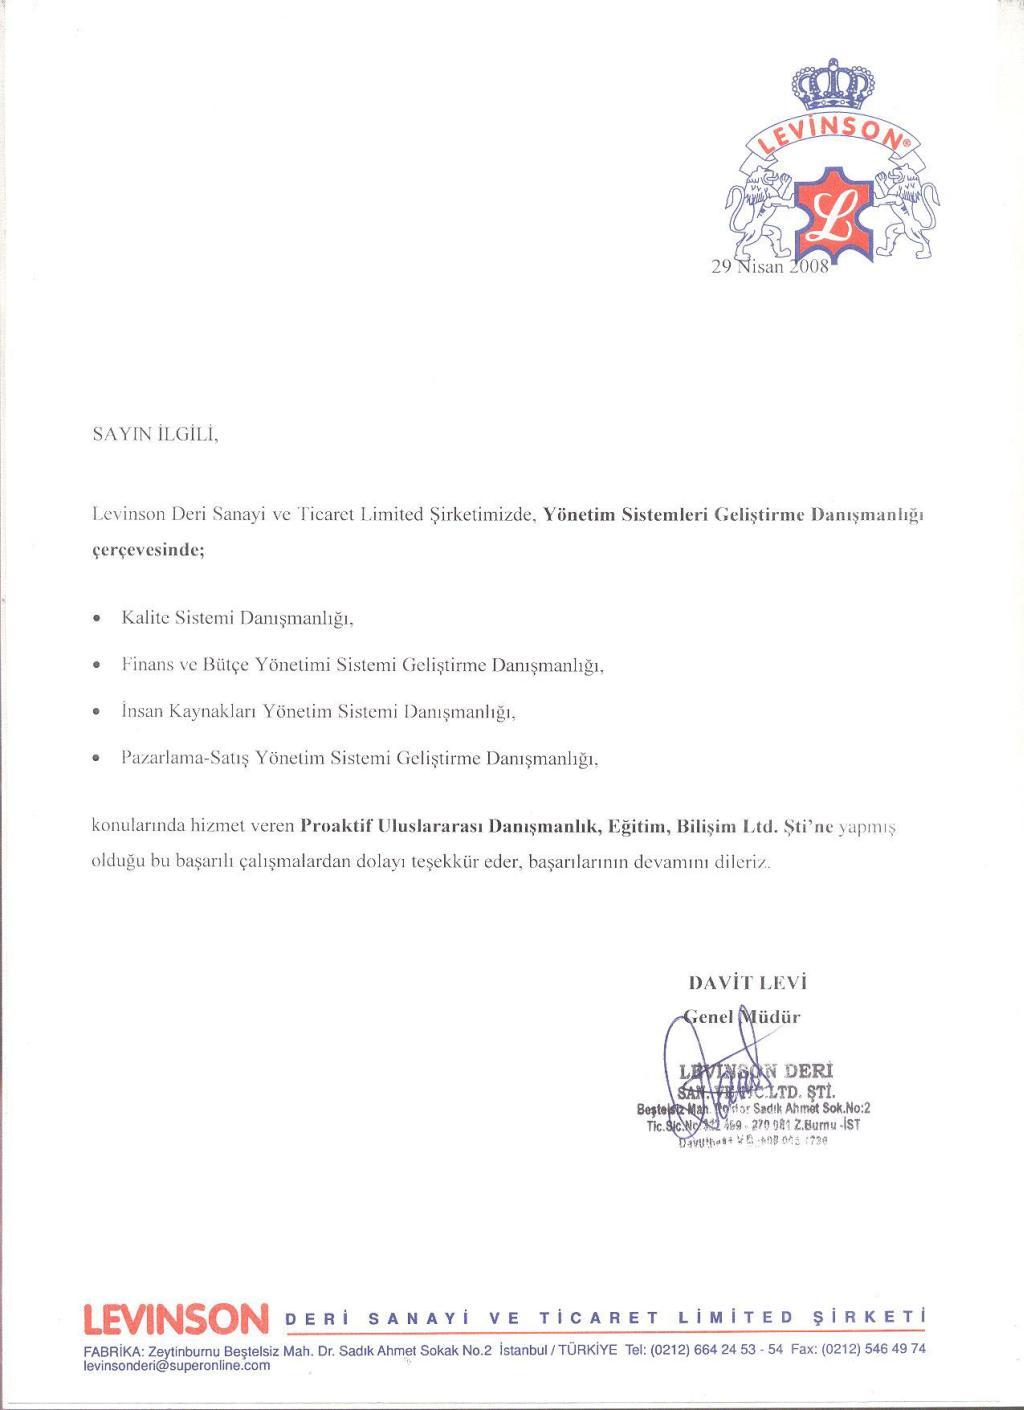 Referans letter idealstalist referans letter altavistaventures Gallery